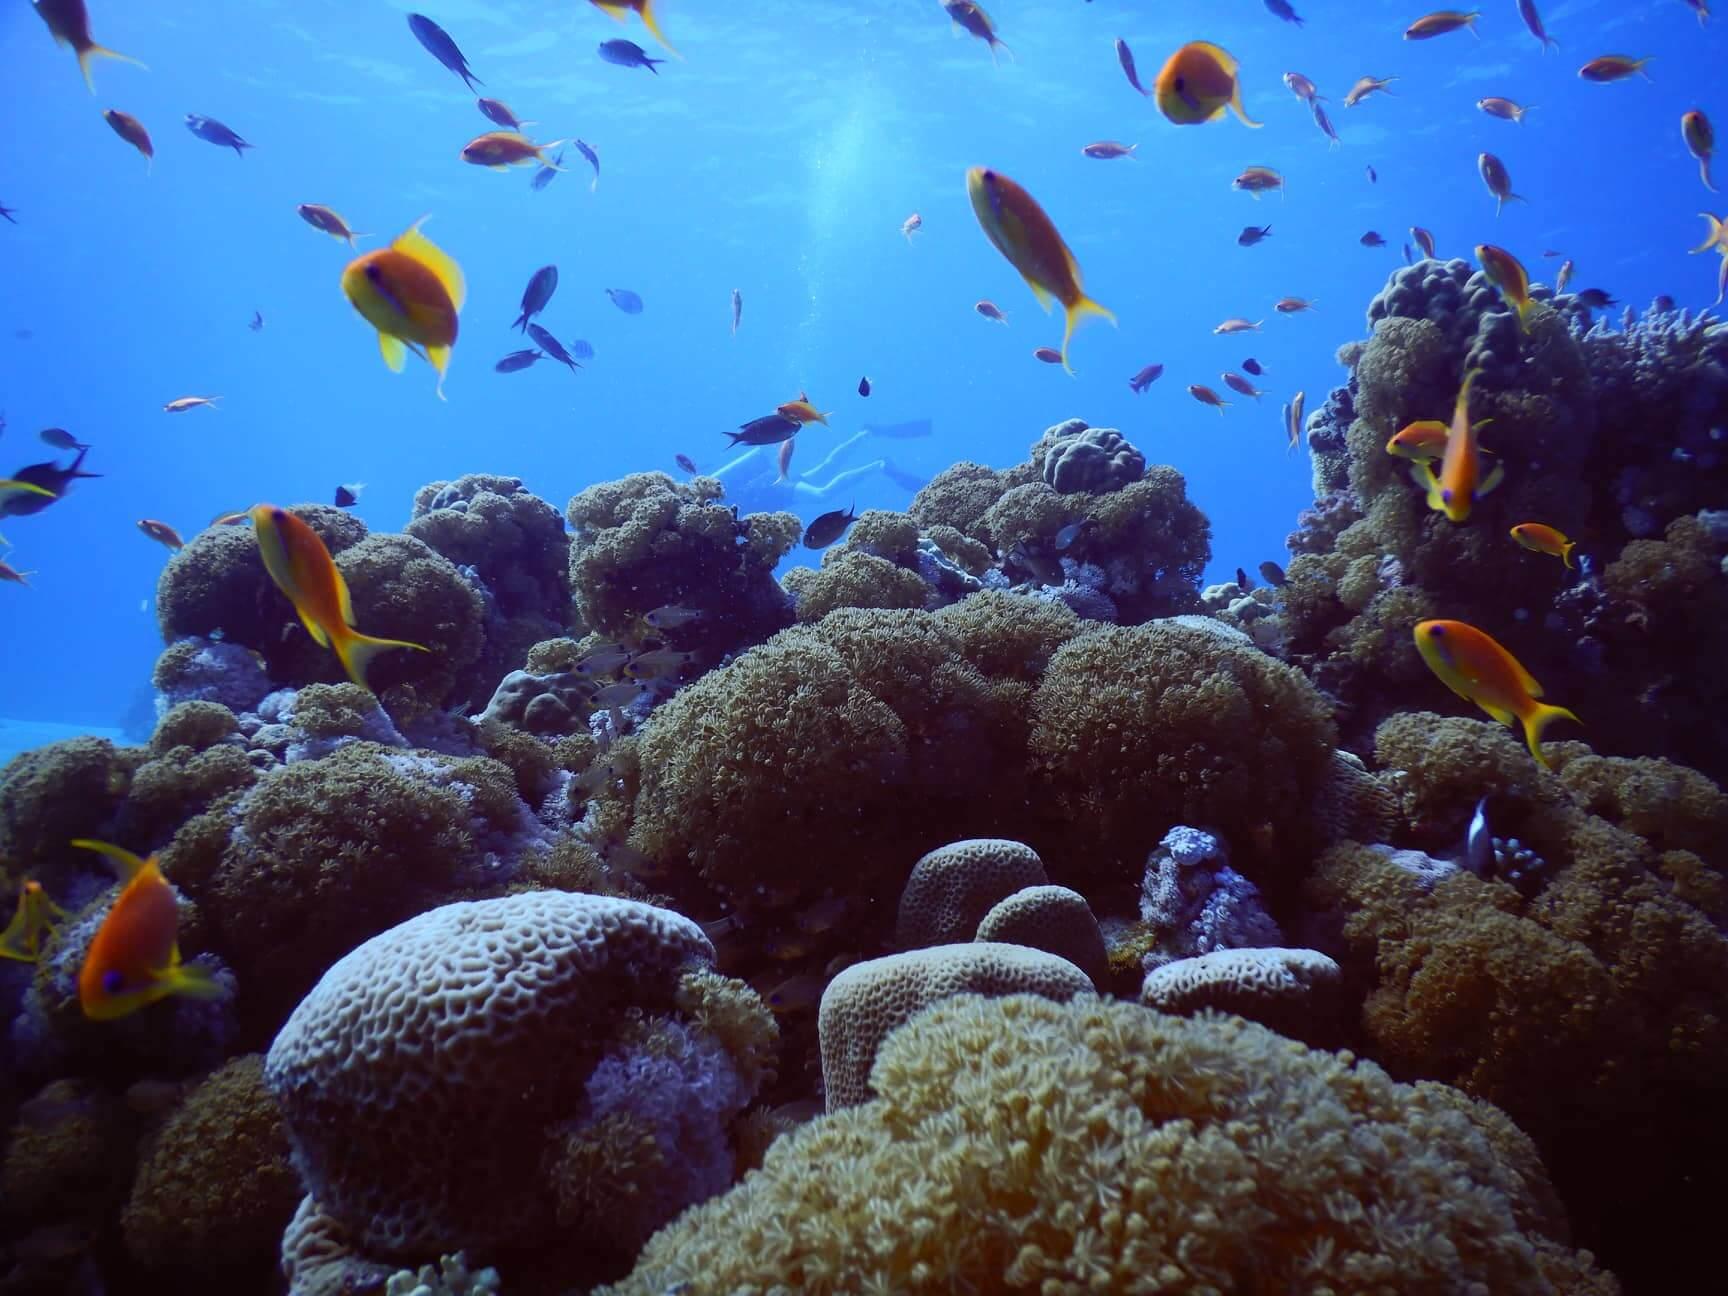 Egypt-REDSEA-Hurghada-DivePro-Academy-Scuba-Diving-Center-Coal-Reef3